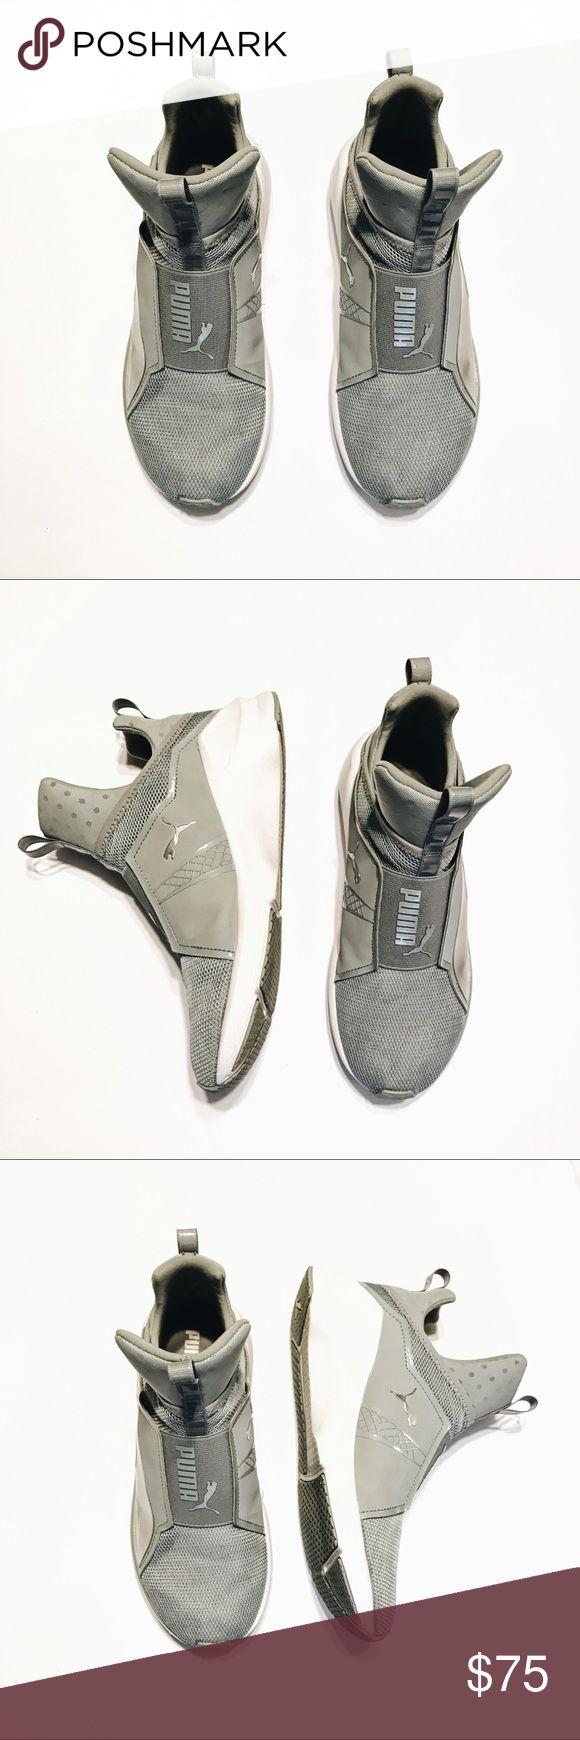 "KYLIE JENNER Puma Fierce Shoe Gently used ""Kylie Jenner"" Puma Fierce shoe (SIZE 7.5) Puma Shoes Sneakers"